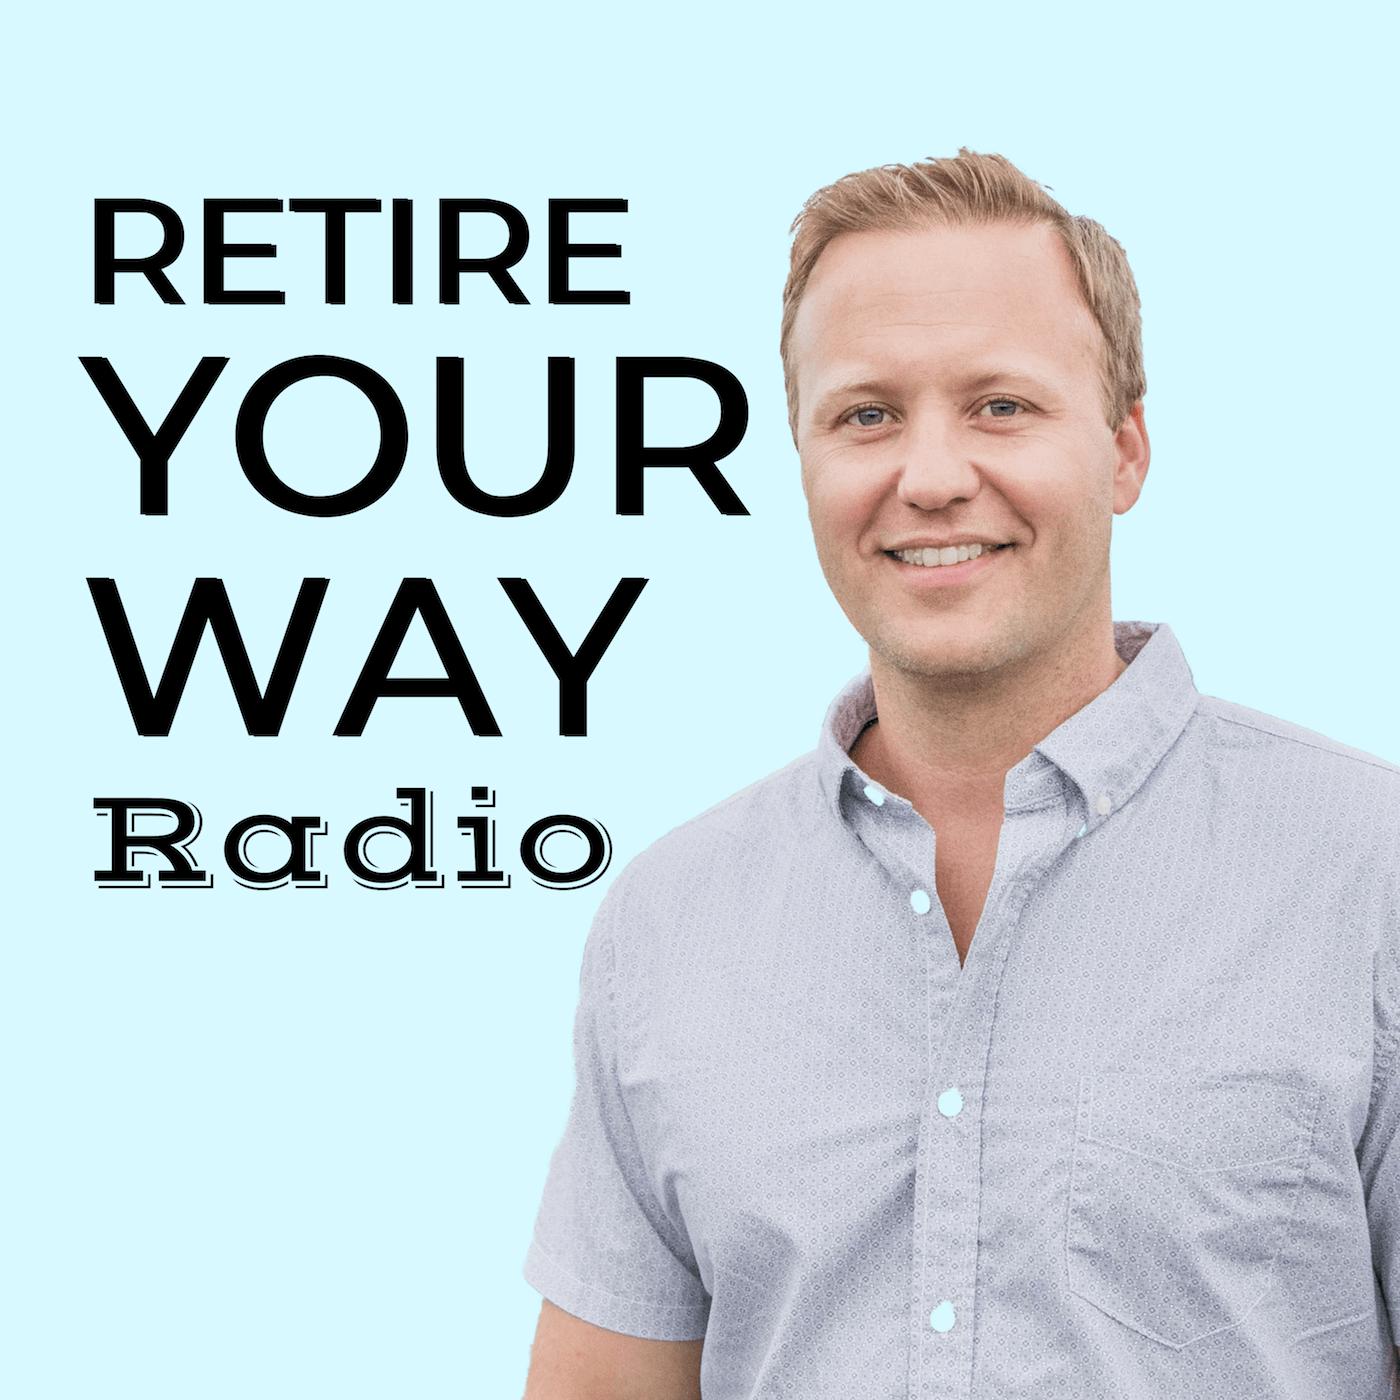 Retire Your Way Radio show art